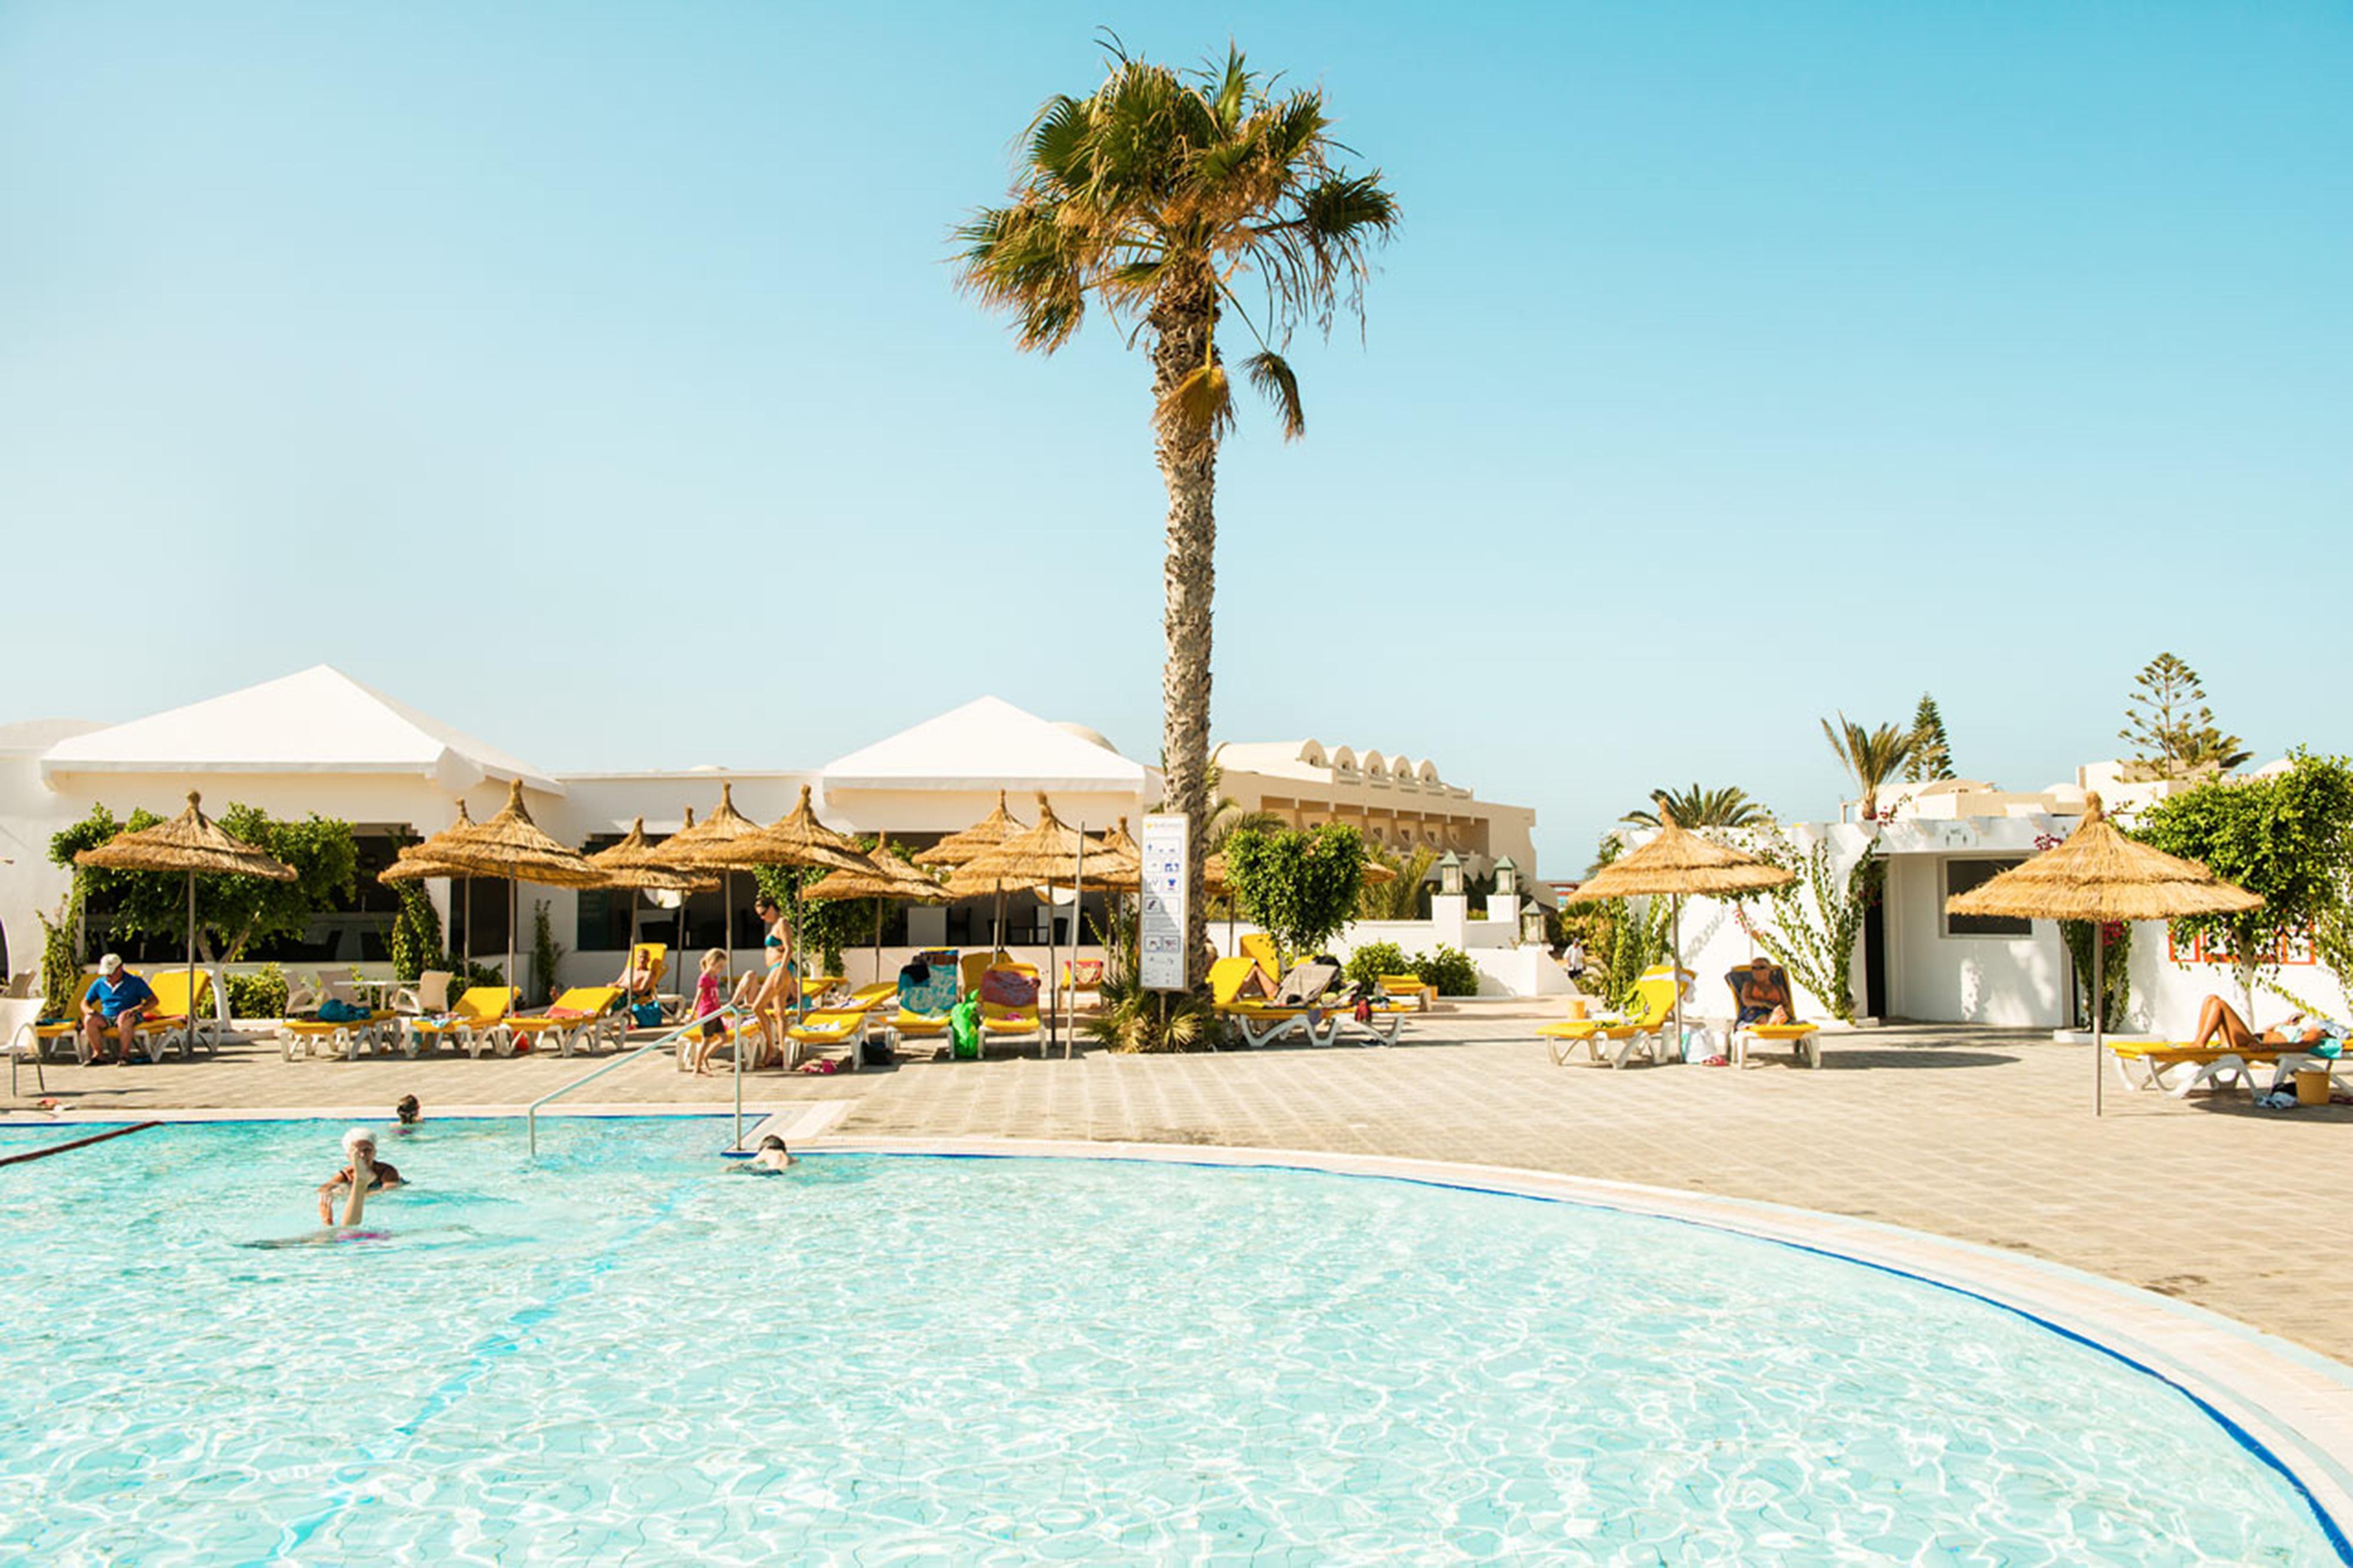 Miramar djerba hotel djerba midoun tunisie miramar for Hotels djerba